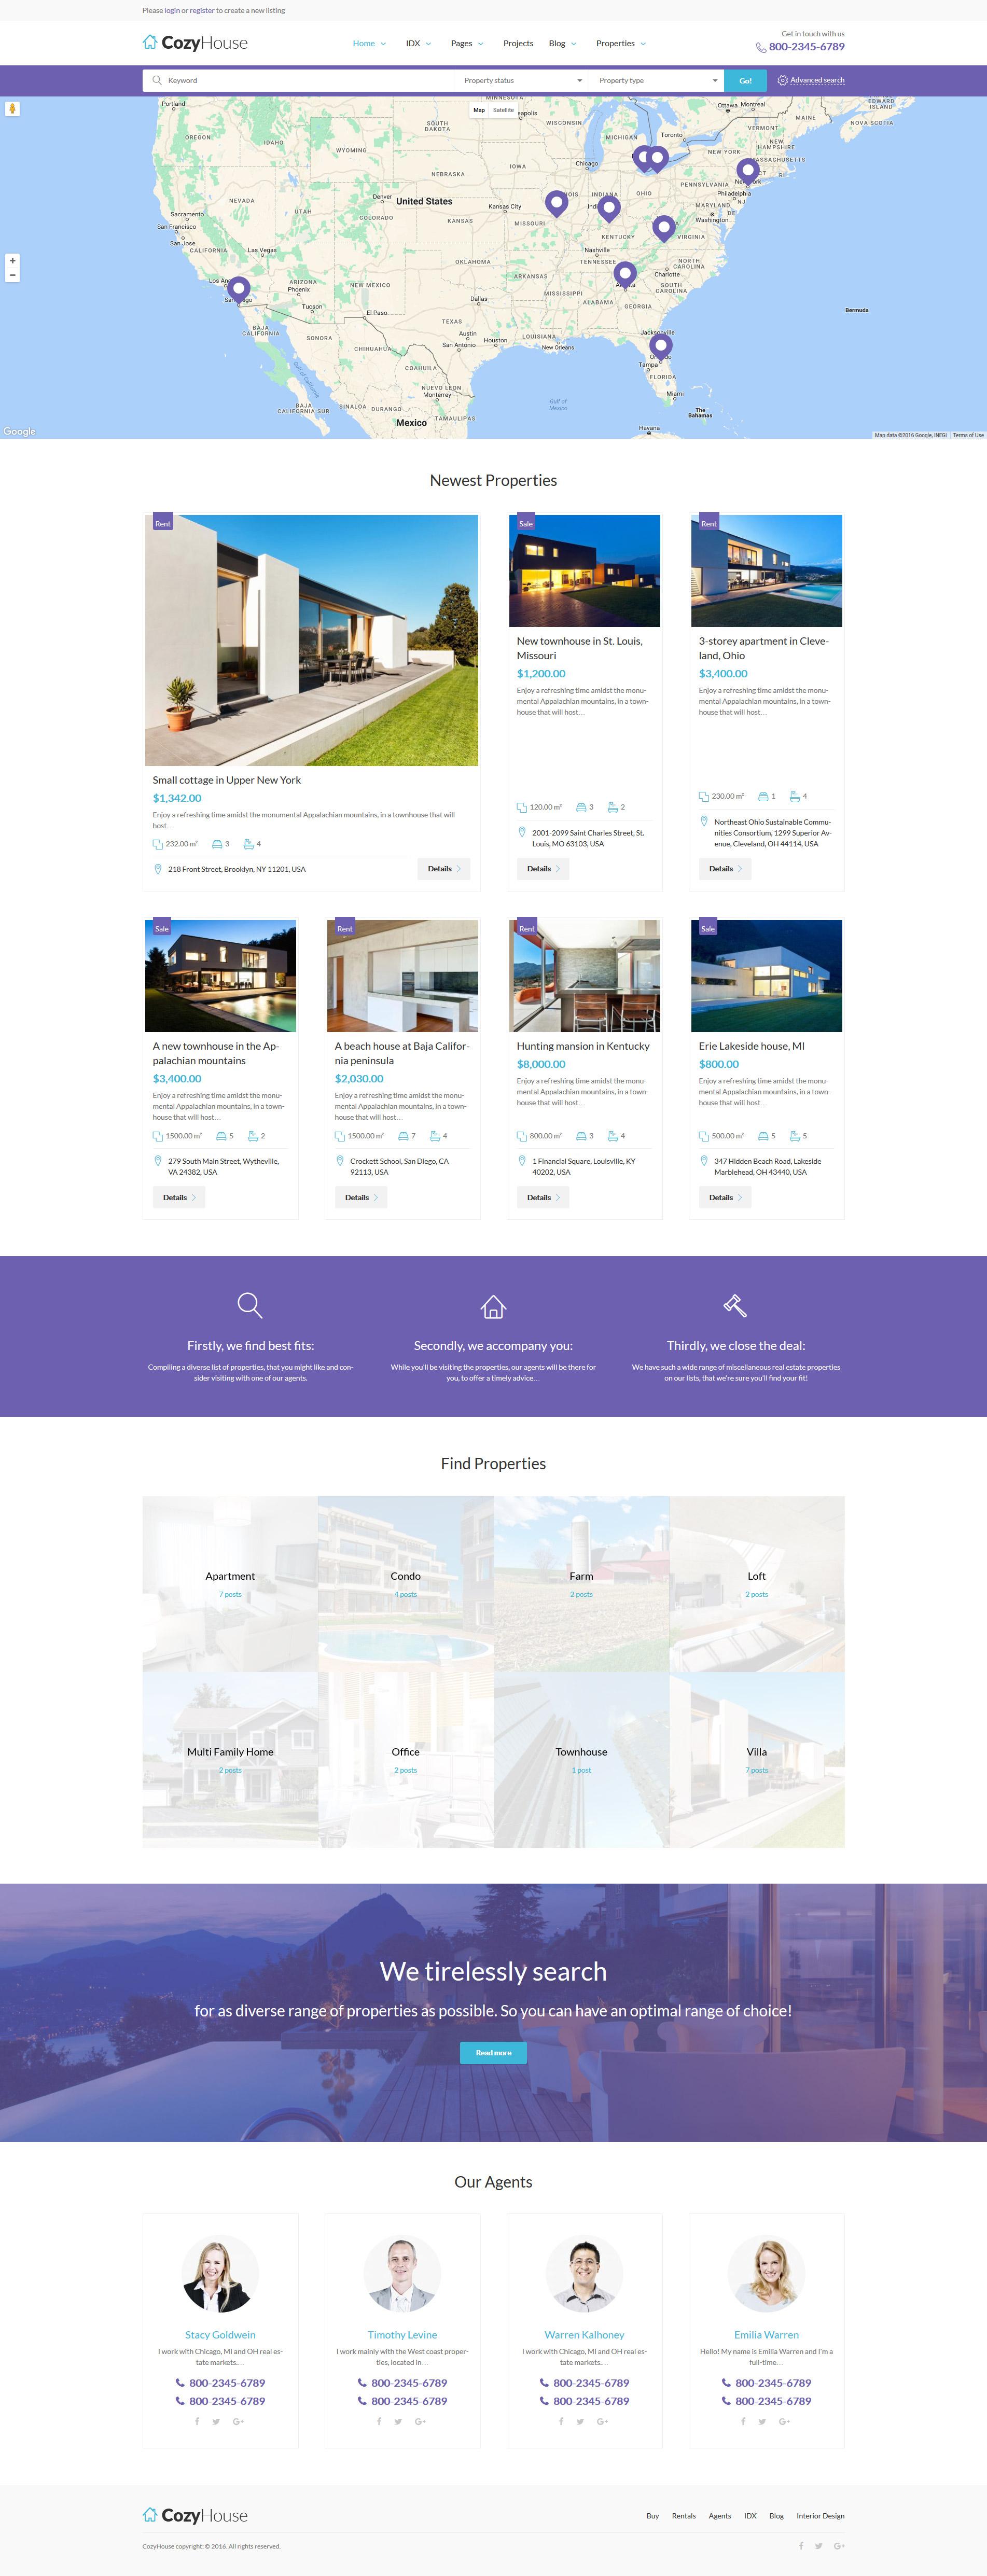 CozyHouse - Real Estate Premium №61222 - скриншот